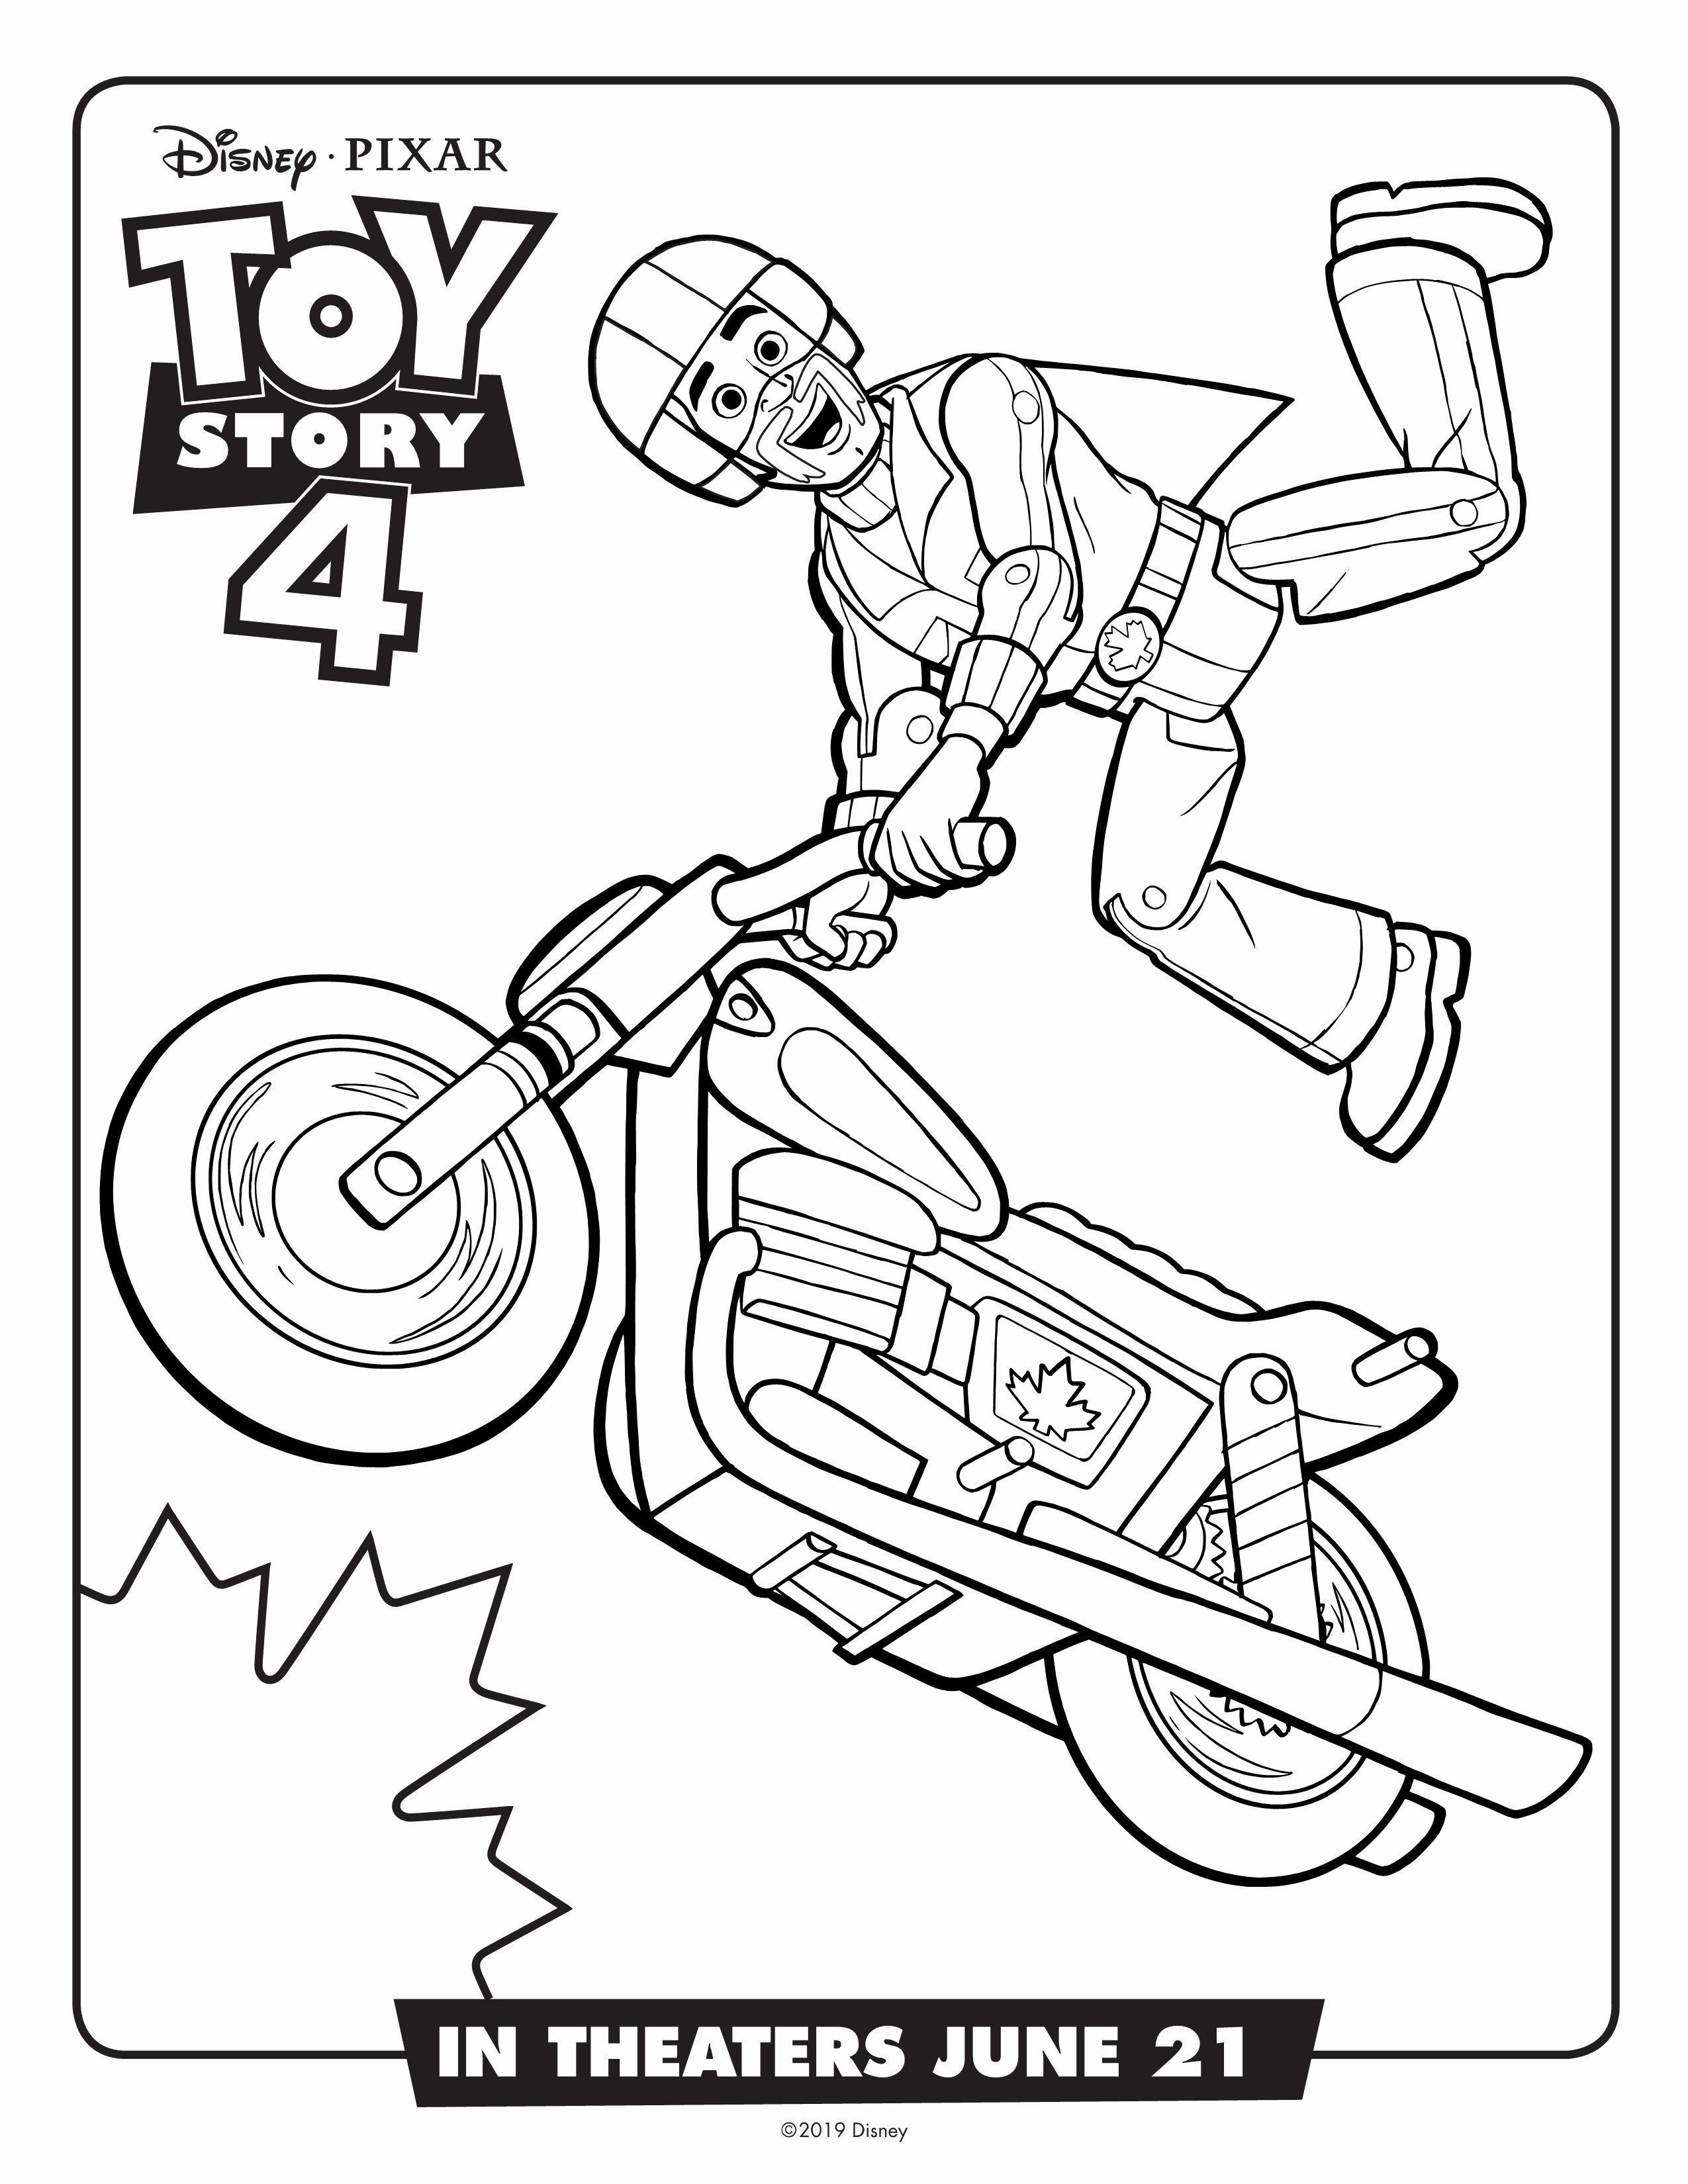 Coloring Toy Story Book Unique Disney Coloring Pages Toy Story 4 Toy Story Coloring Pages Disney Coloring Pages Toy Story Printables